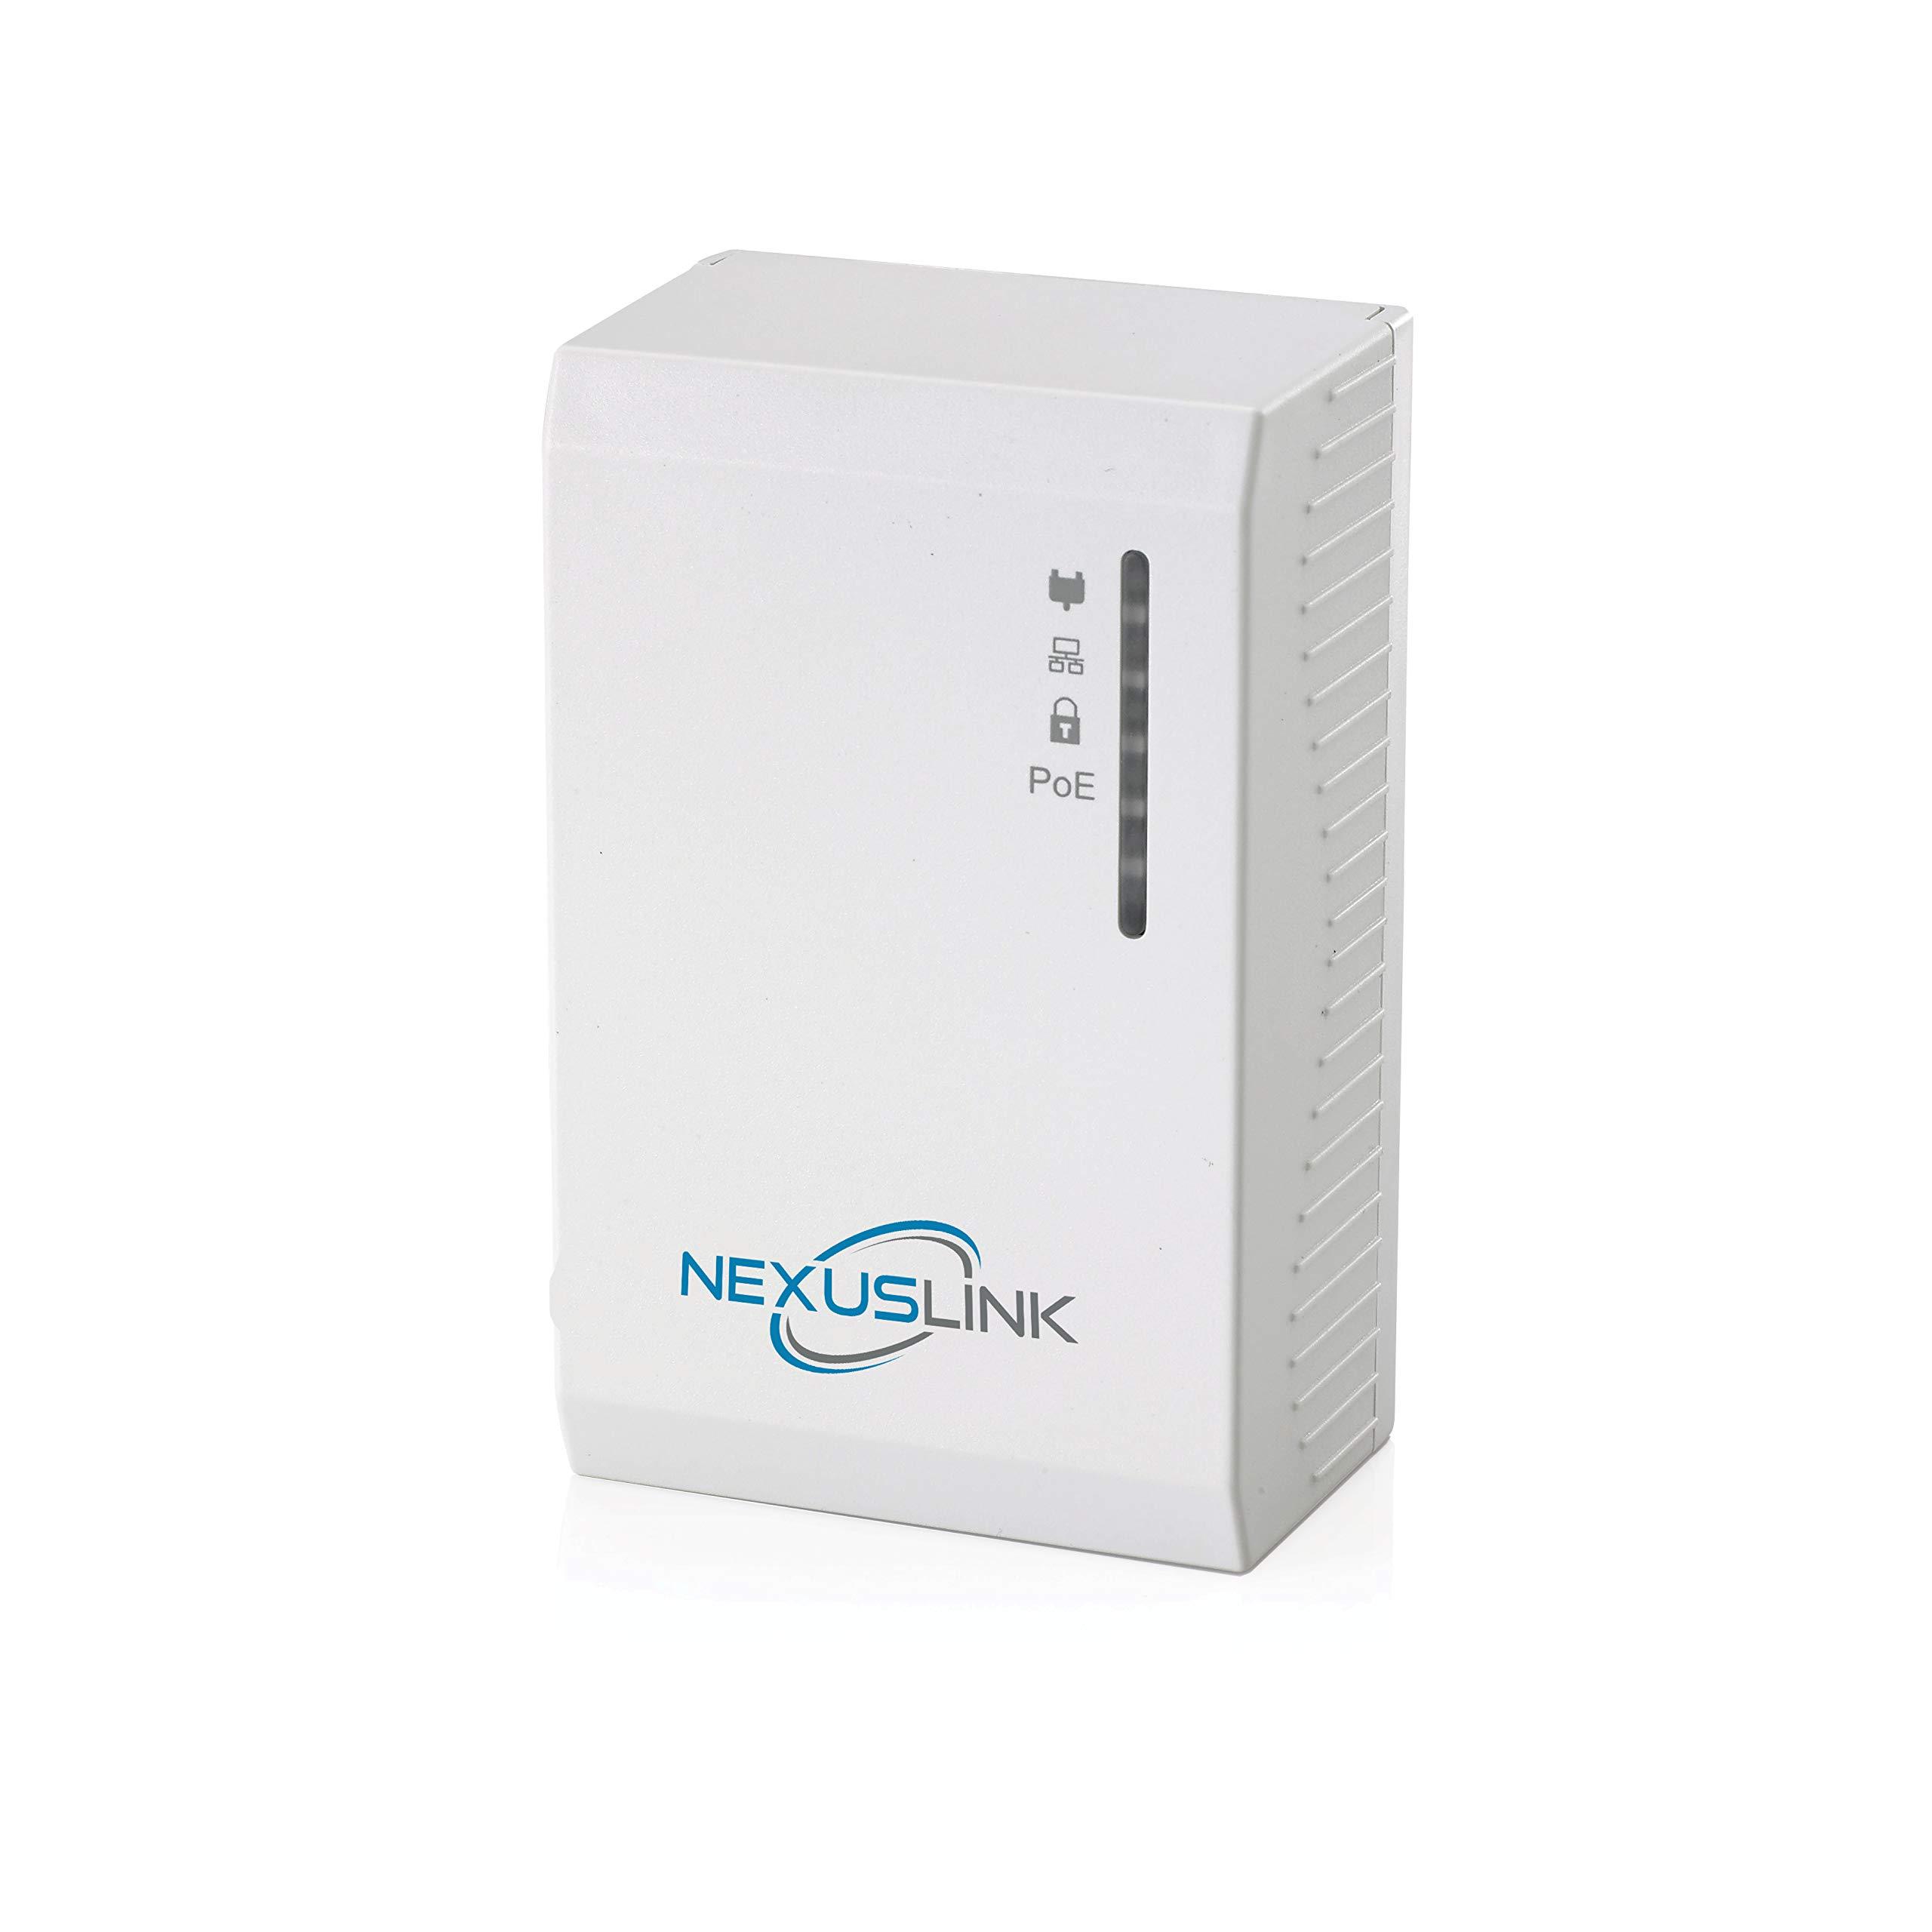 NexusLink G.hn Powerline Adapter with Power Over Ethernet (PoE) I GPL-1200PoE by NEXUSLINK